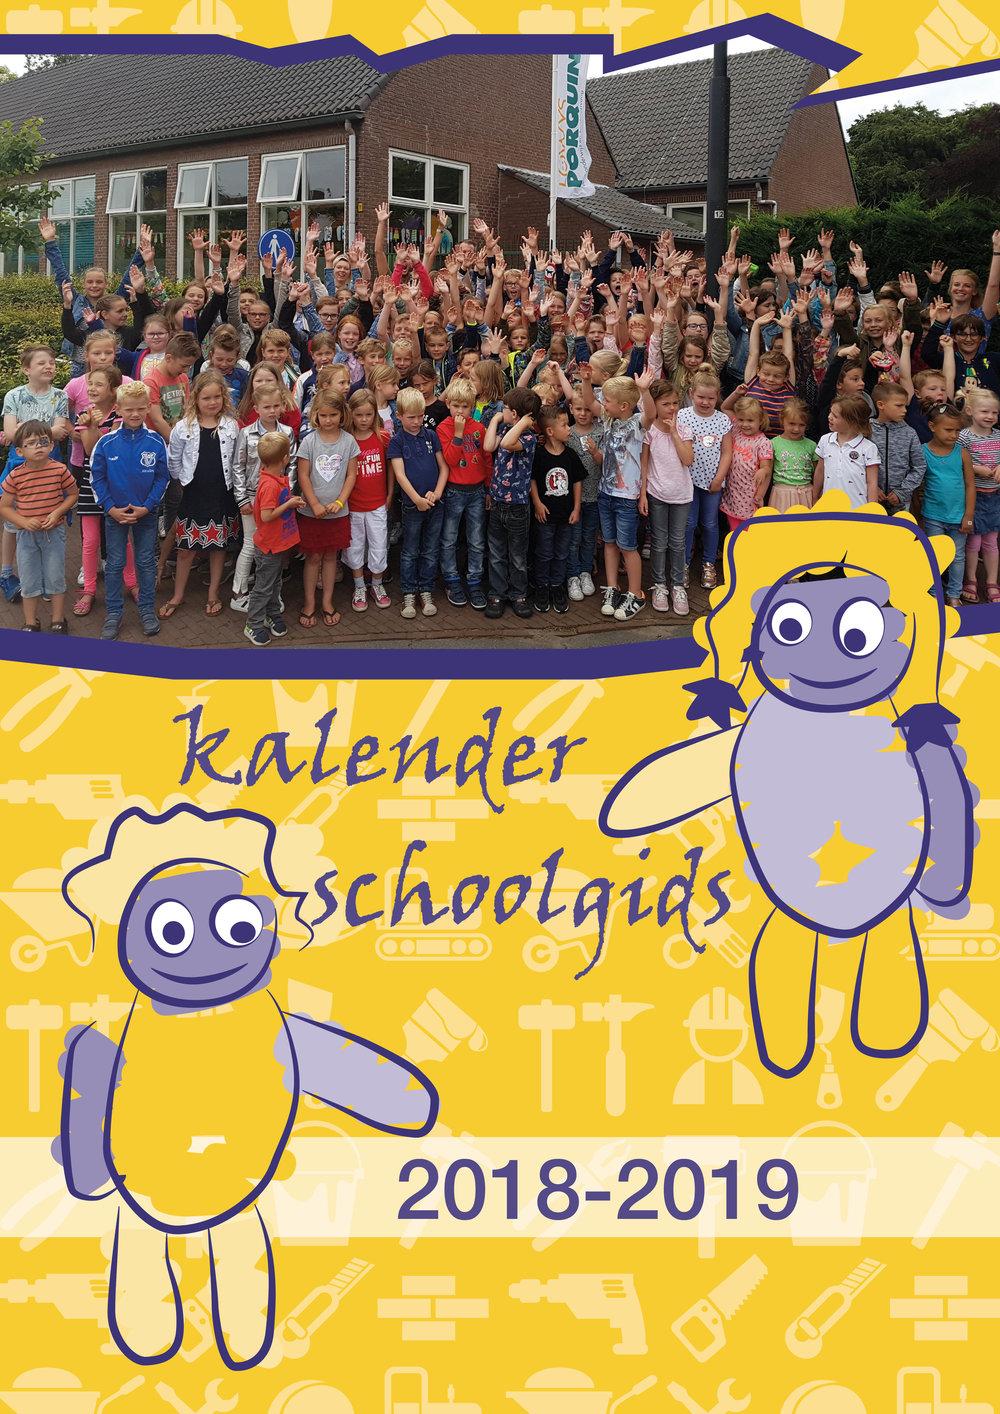 ZandBij_SteMarie_kalender+schoolgids1.jpg